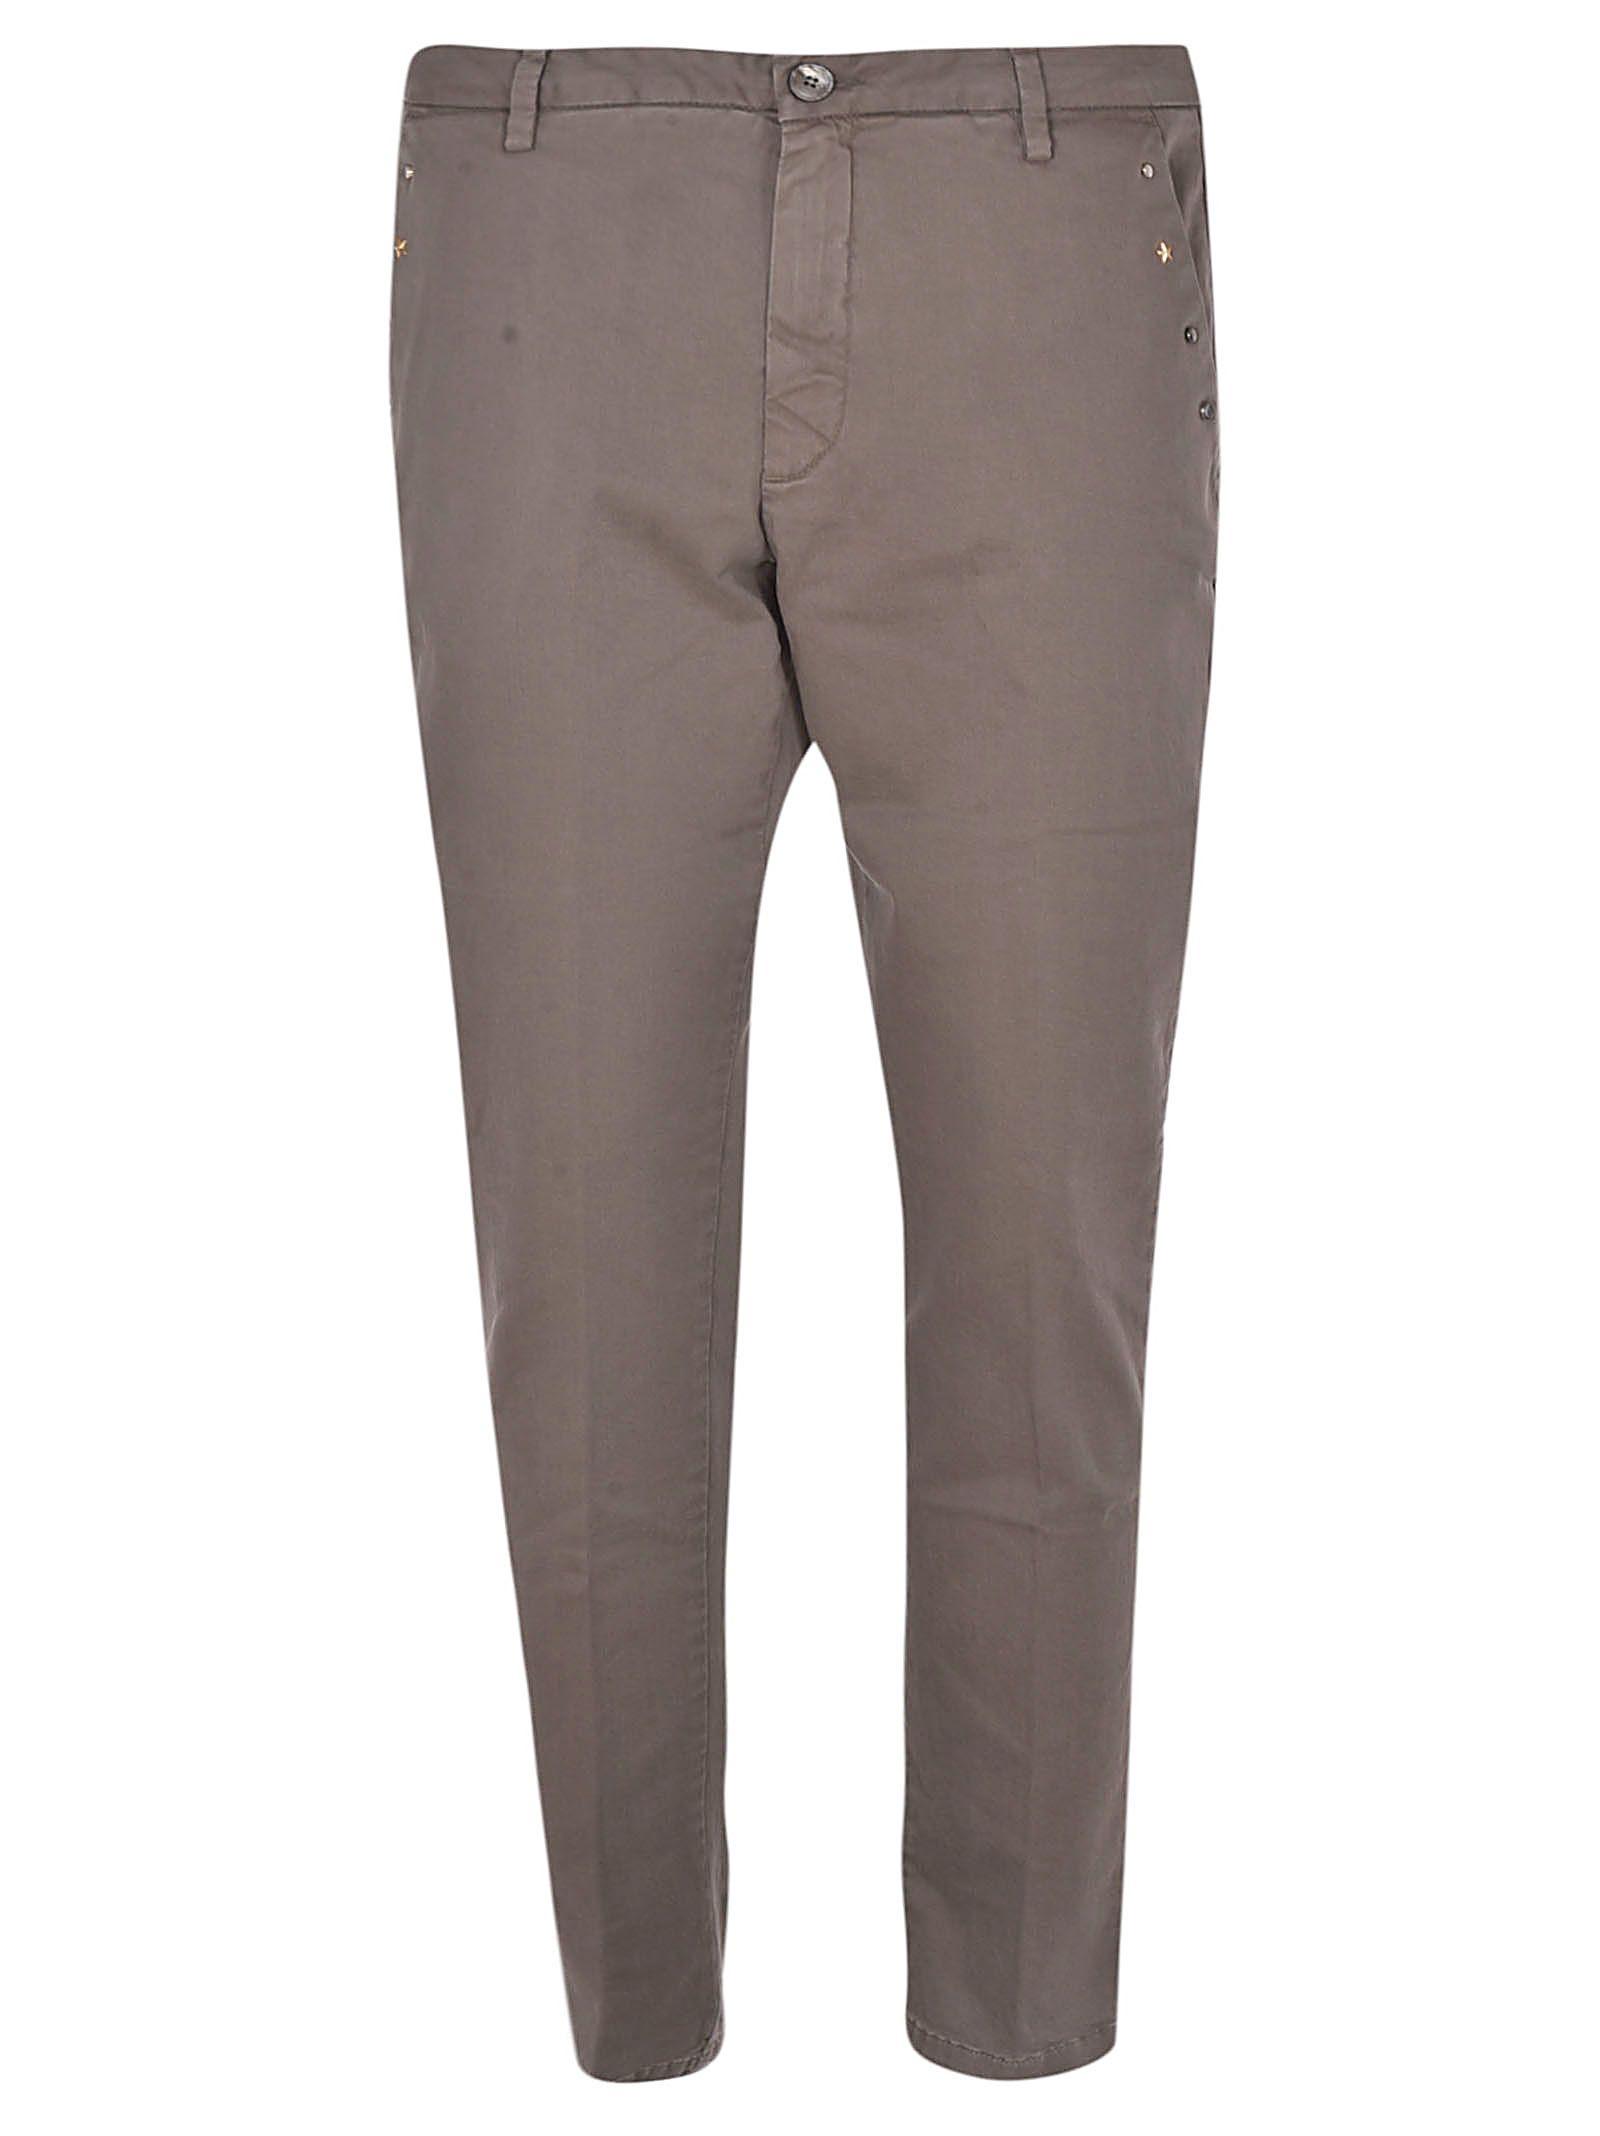 AGLINI Studded Trousers in Dir 32Gw